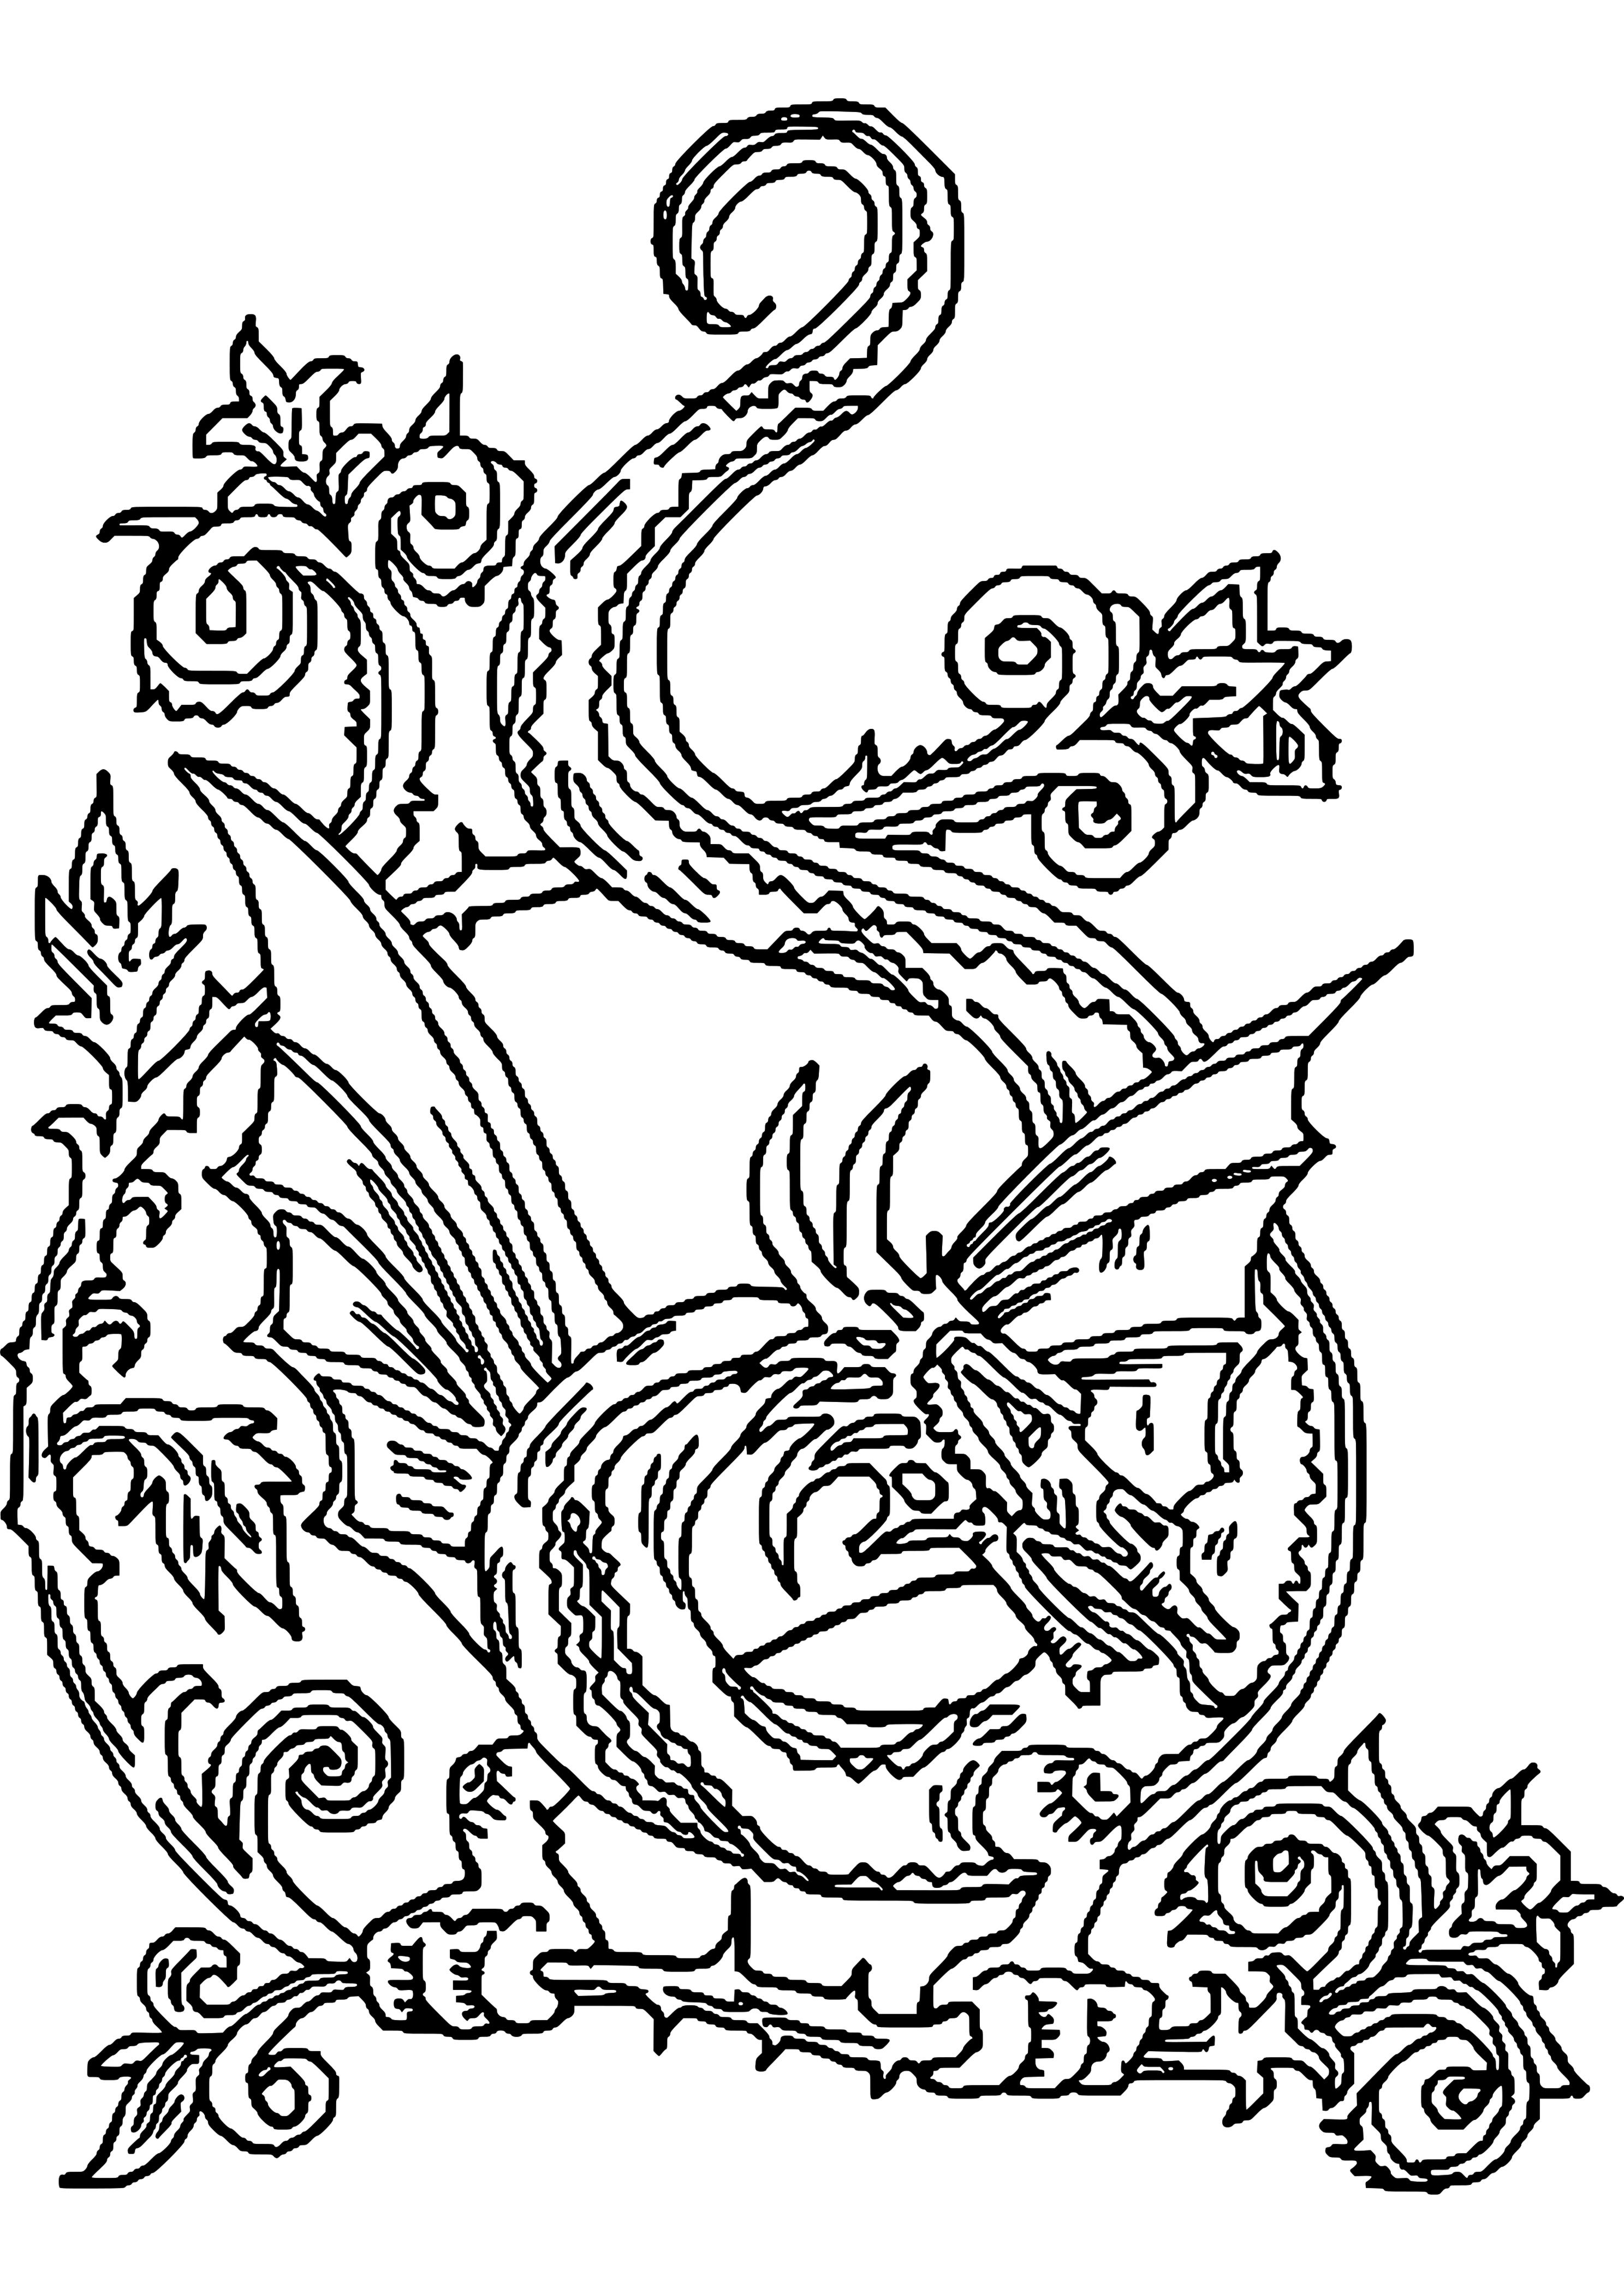 Dibujos De Dragones De Sant Jordi Para Imprimir 1 2975x4200 3375 Png 2975 4200 Malvorlagen Tiere Kostenlose Ausmalbilder Wenn Du Mal Buch